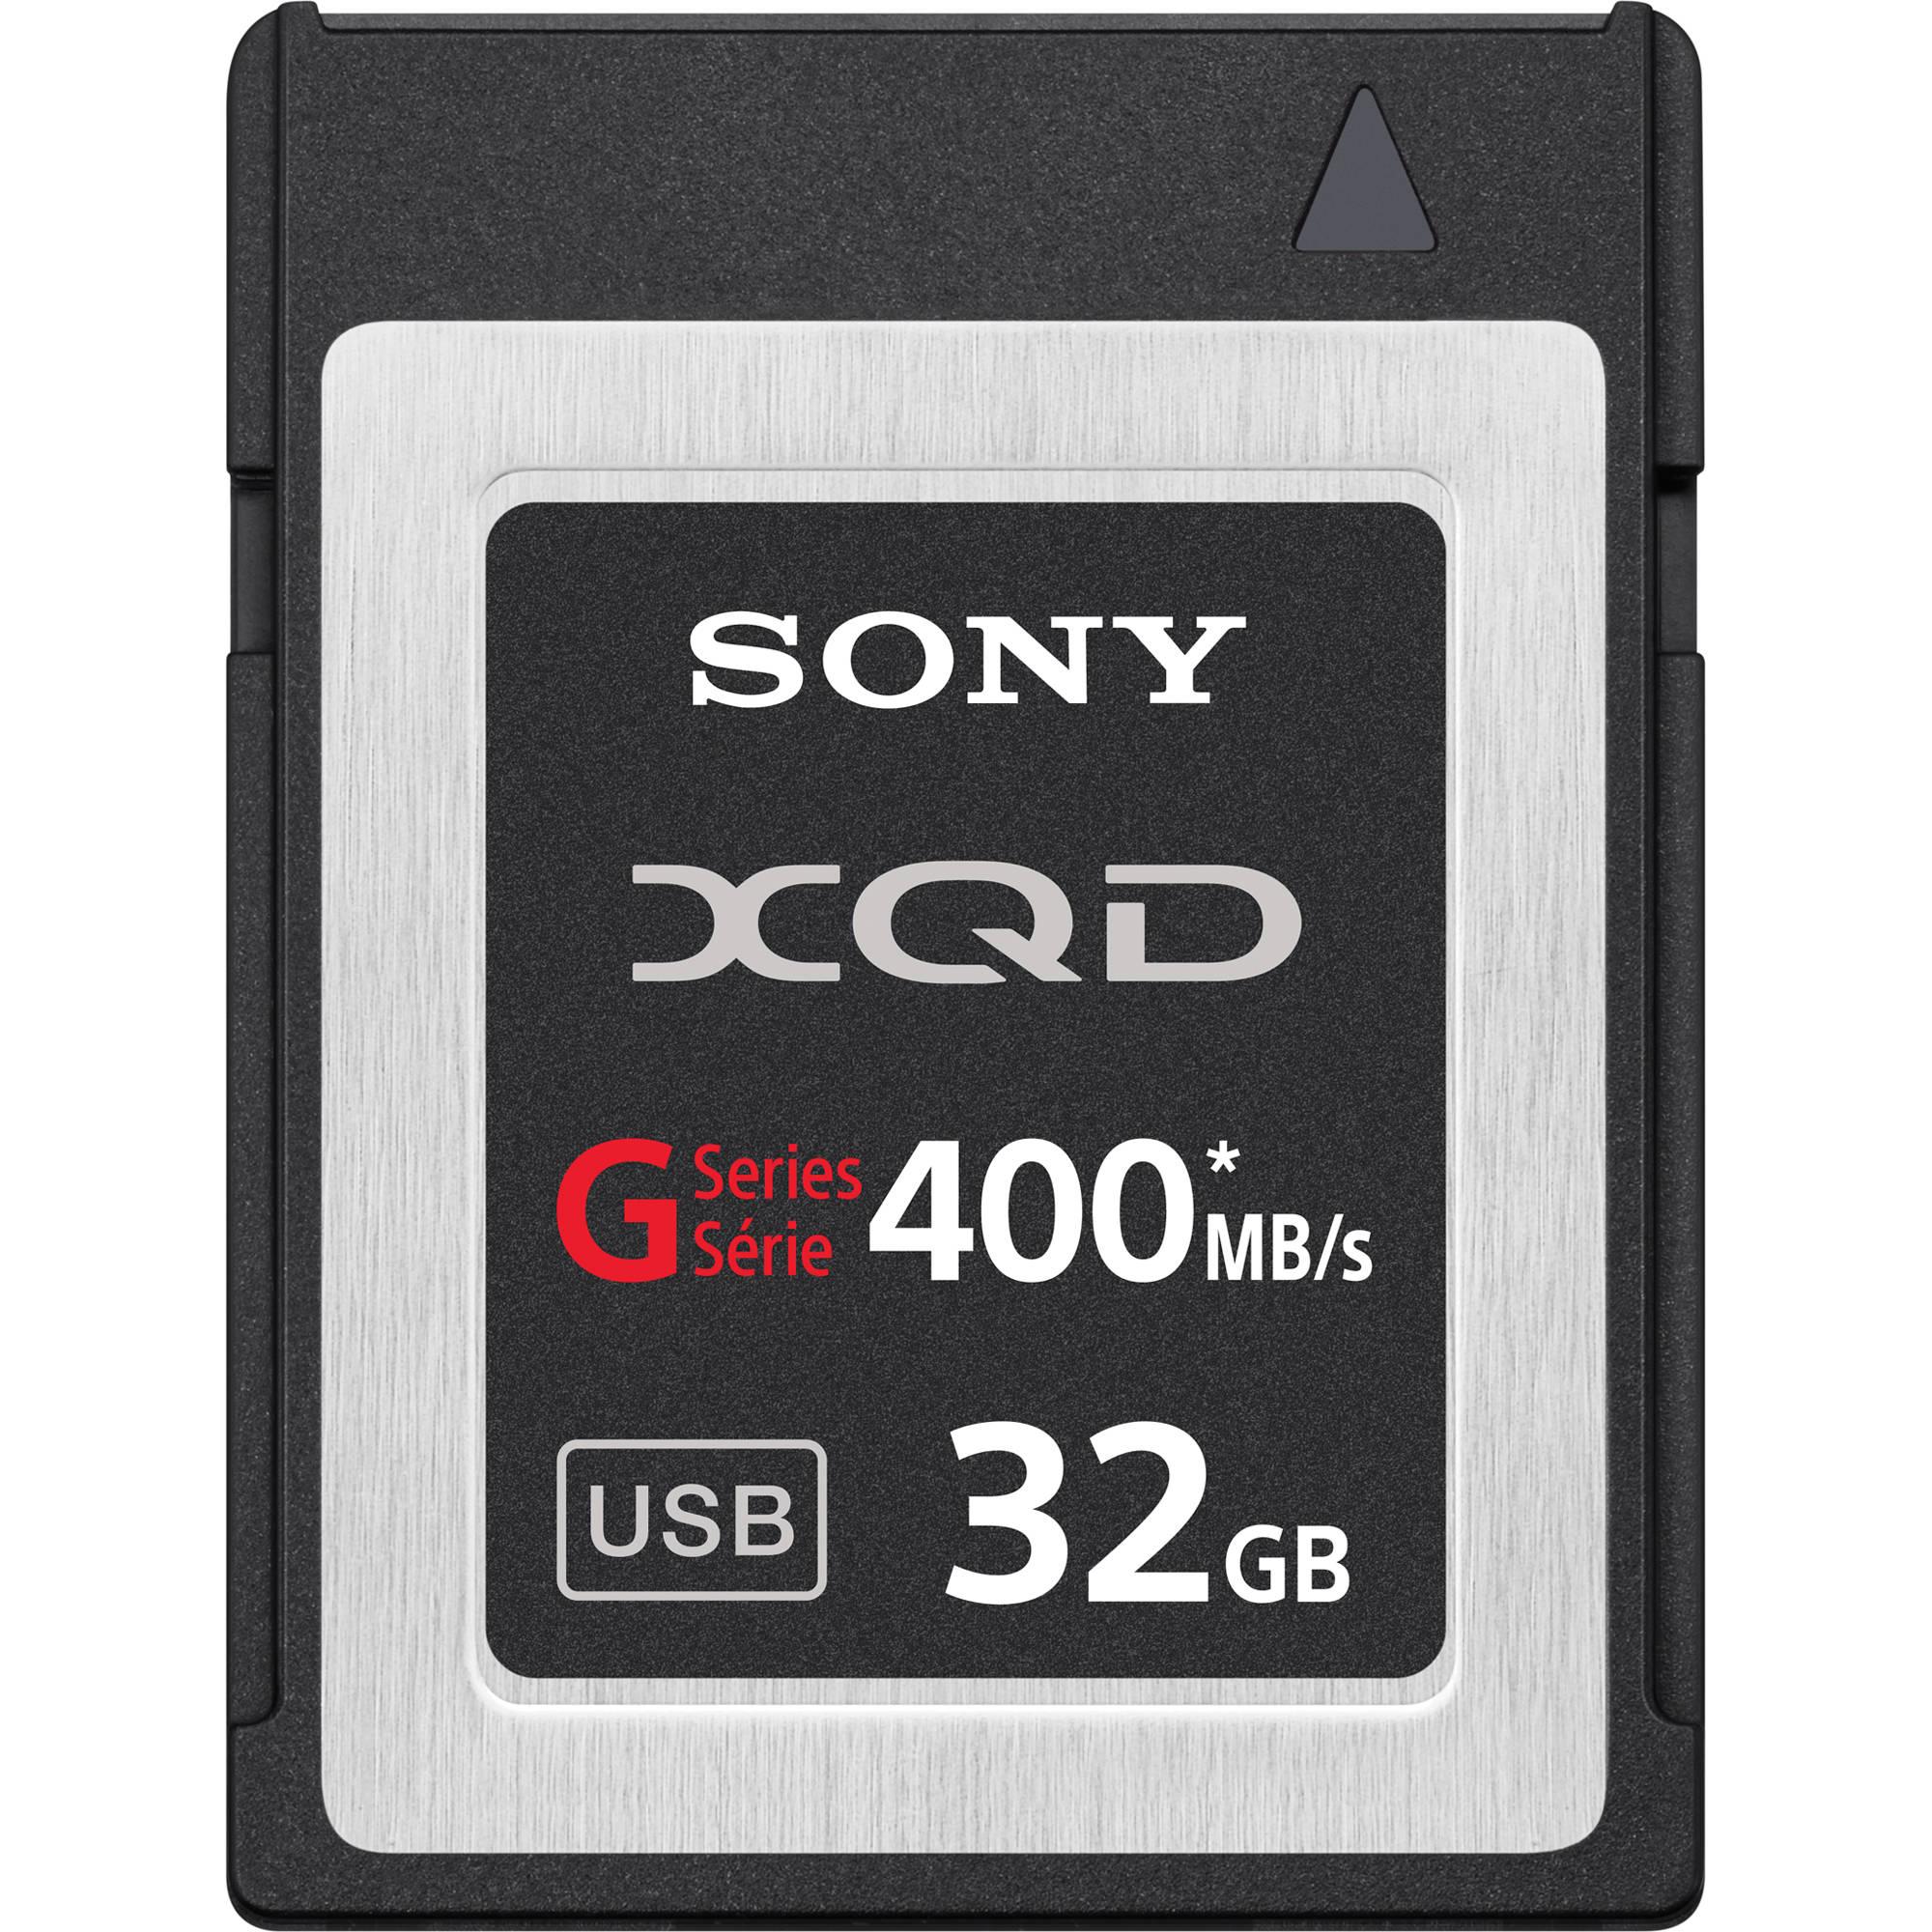 32 gig memory - Sony 32gb G Series Xqd Format Version 2 Memory Card